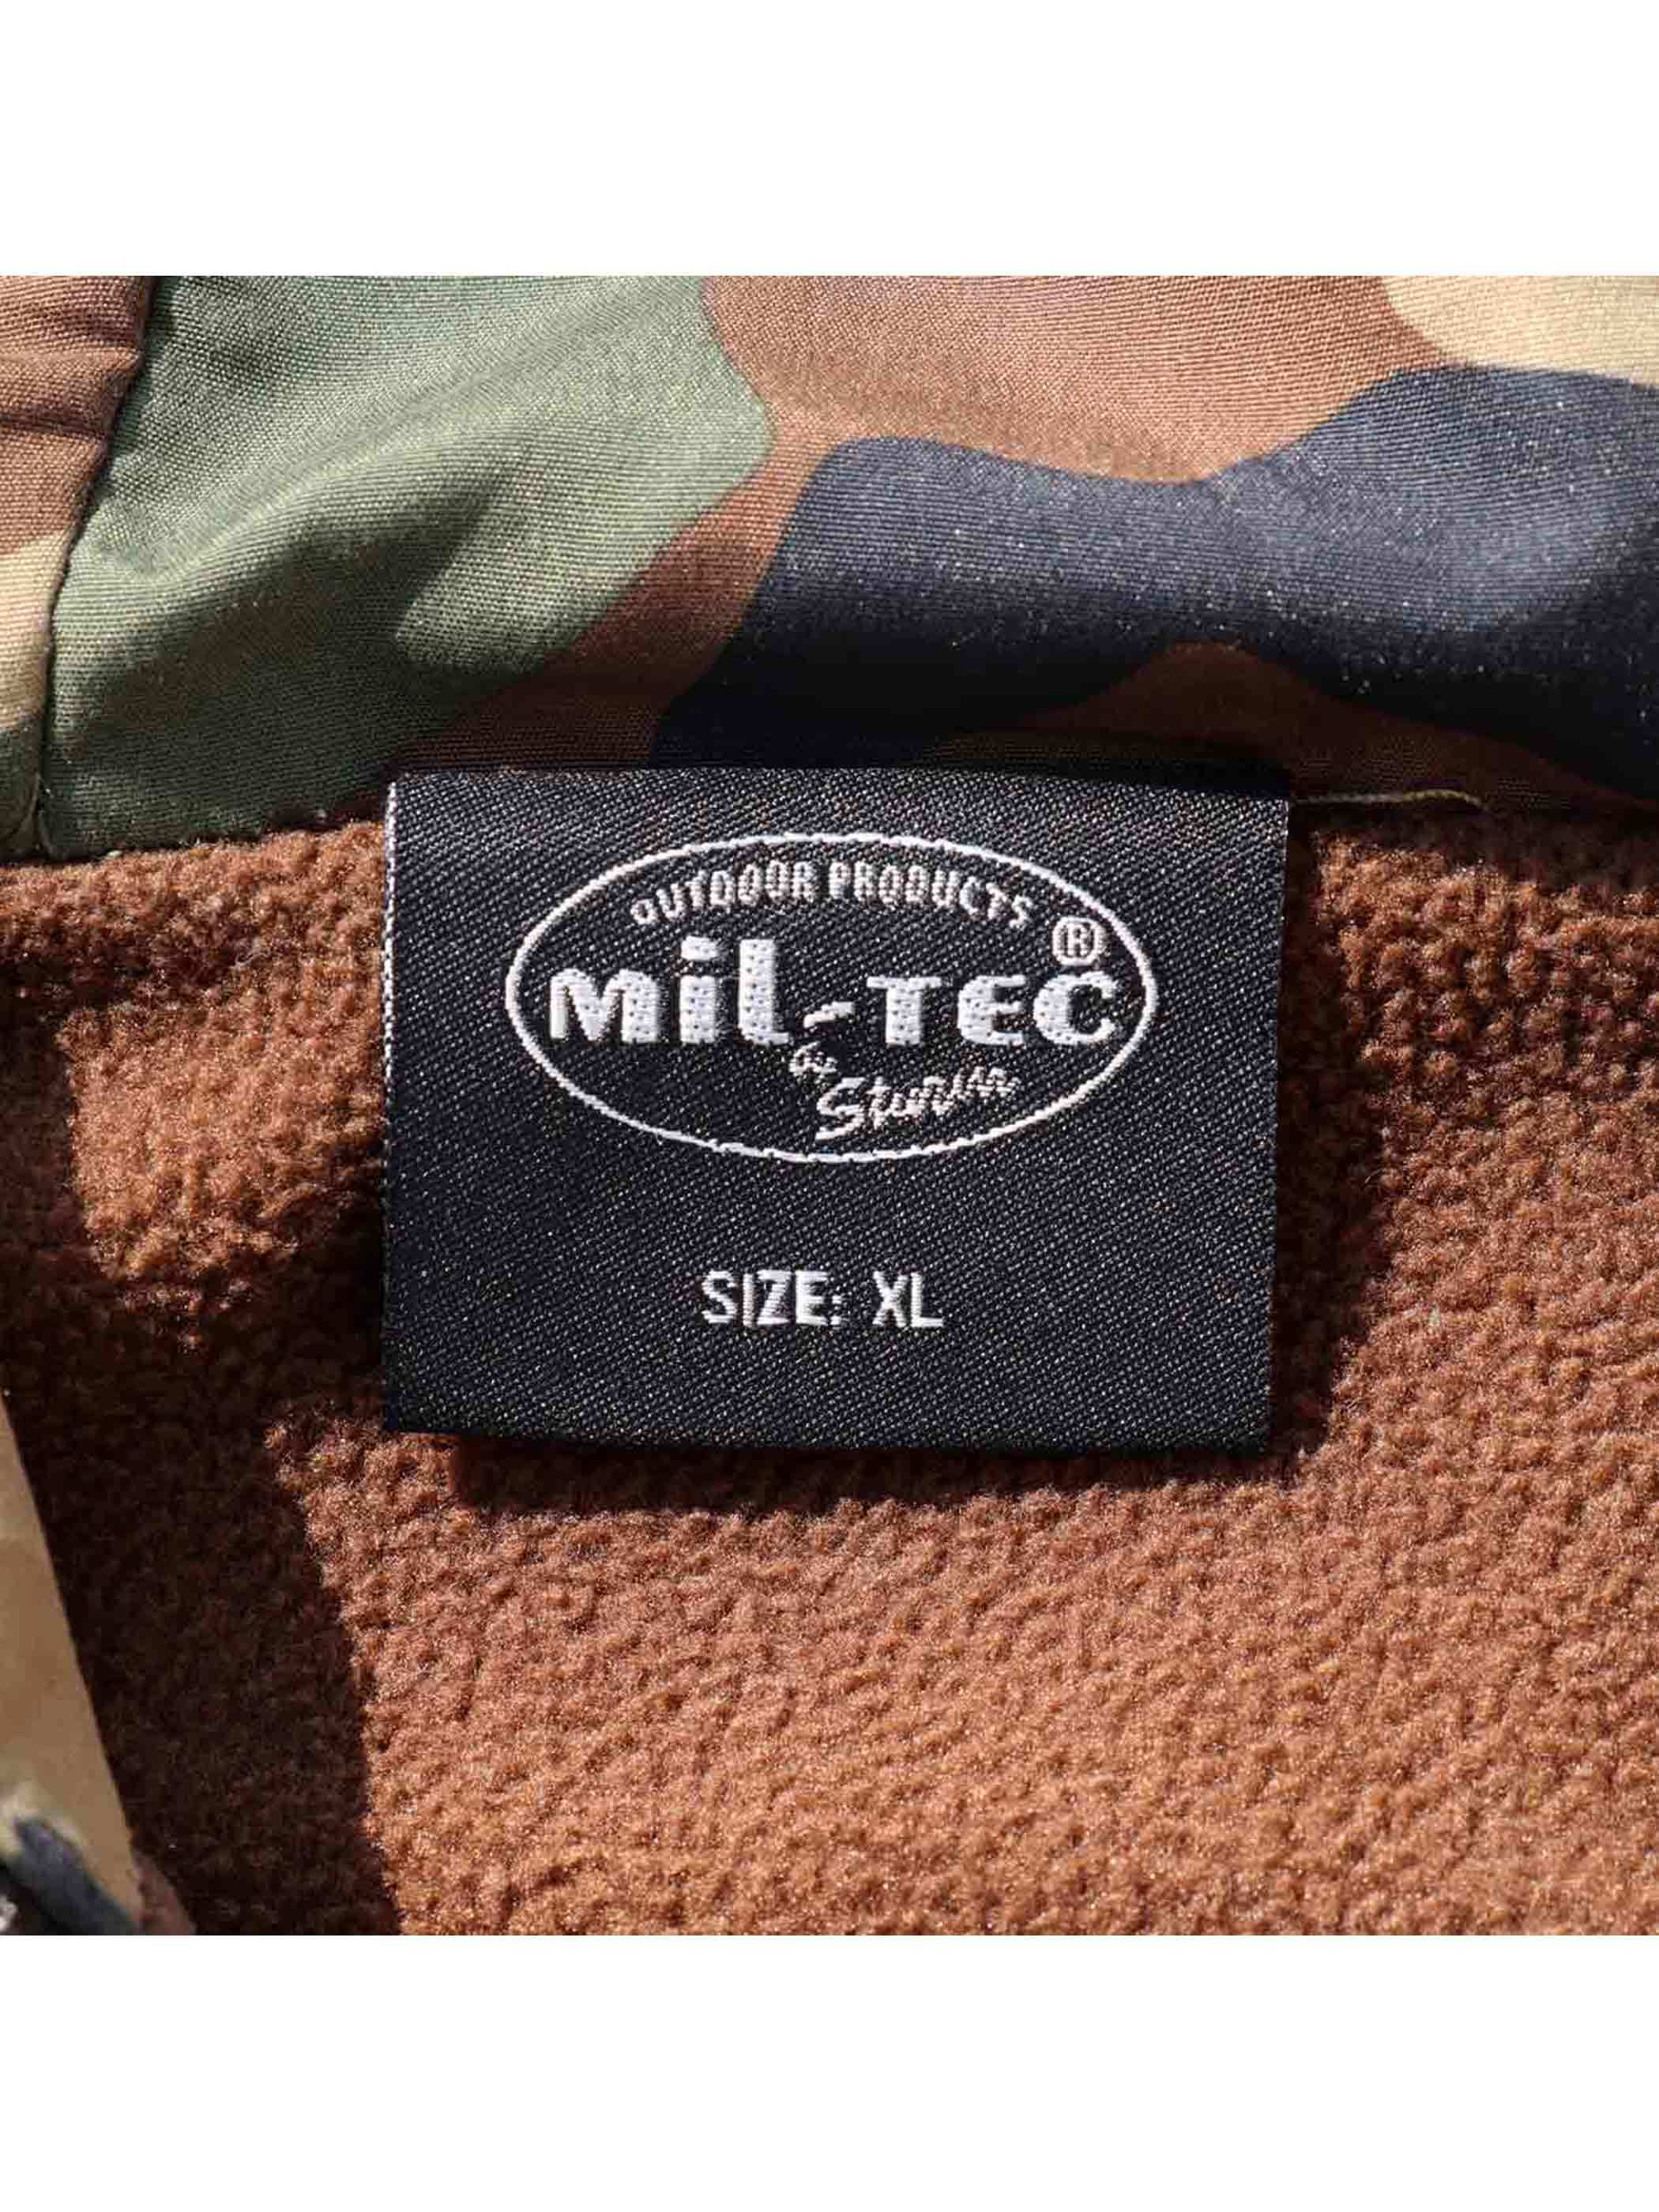 00's~ MIL-TEC Woodland Camo Anorak Parka [XL]